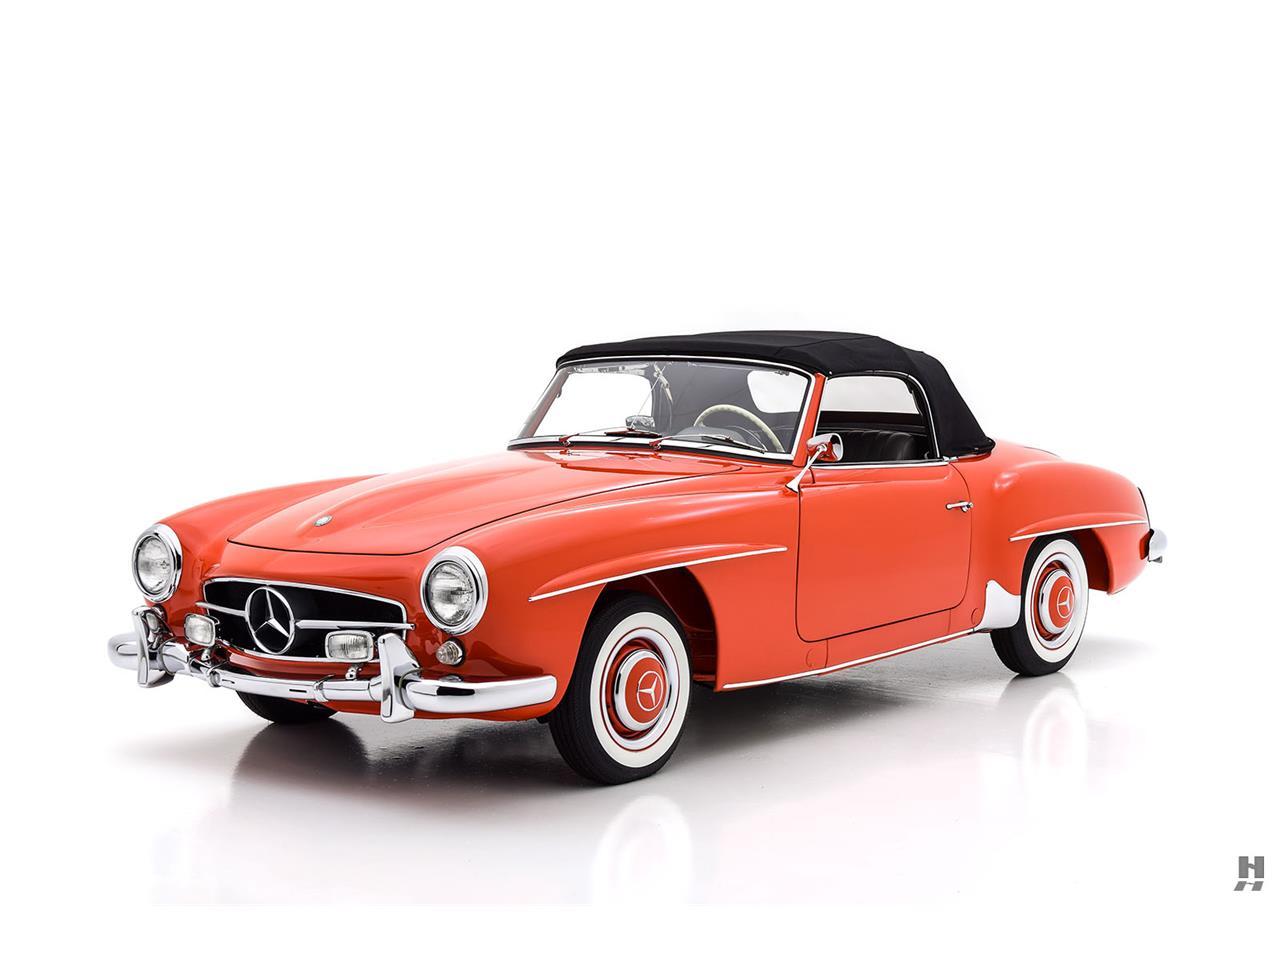 Large Picture of Classic '57 Mercedes-Benz 190SL located in Saint Louis Missouri - $169,500.00 - P2K7